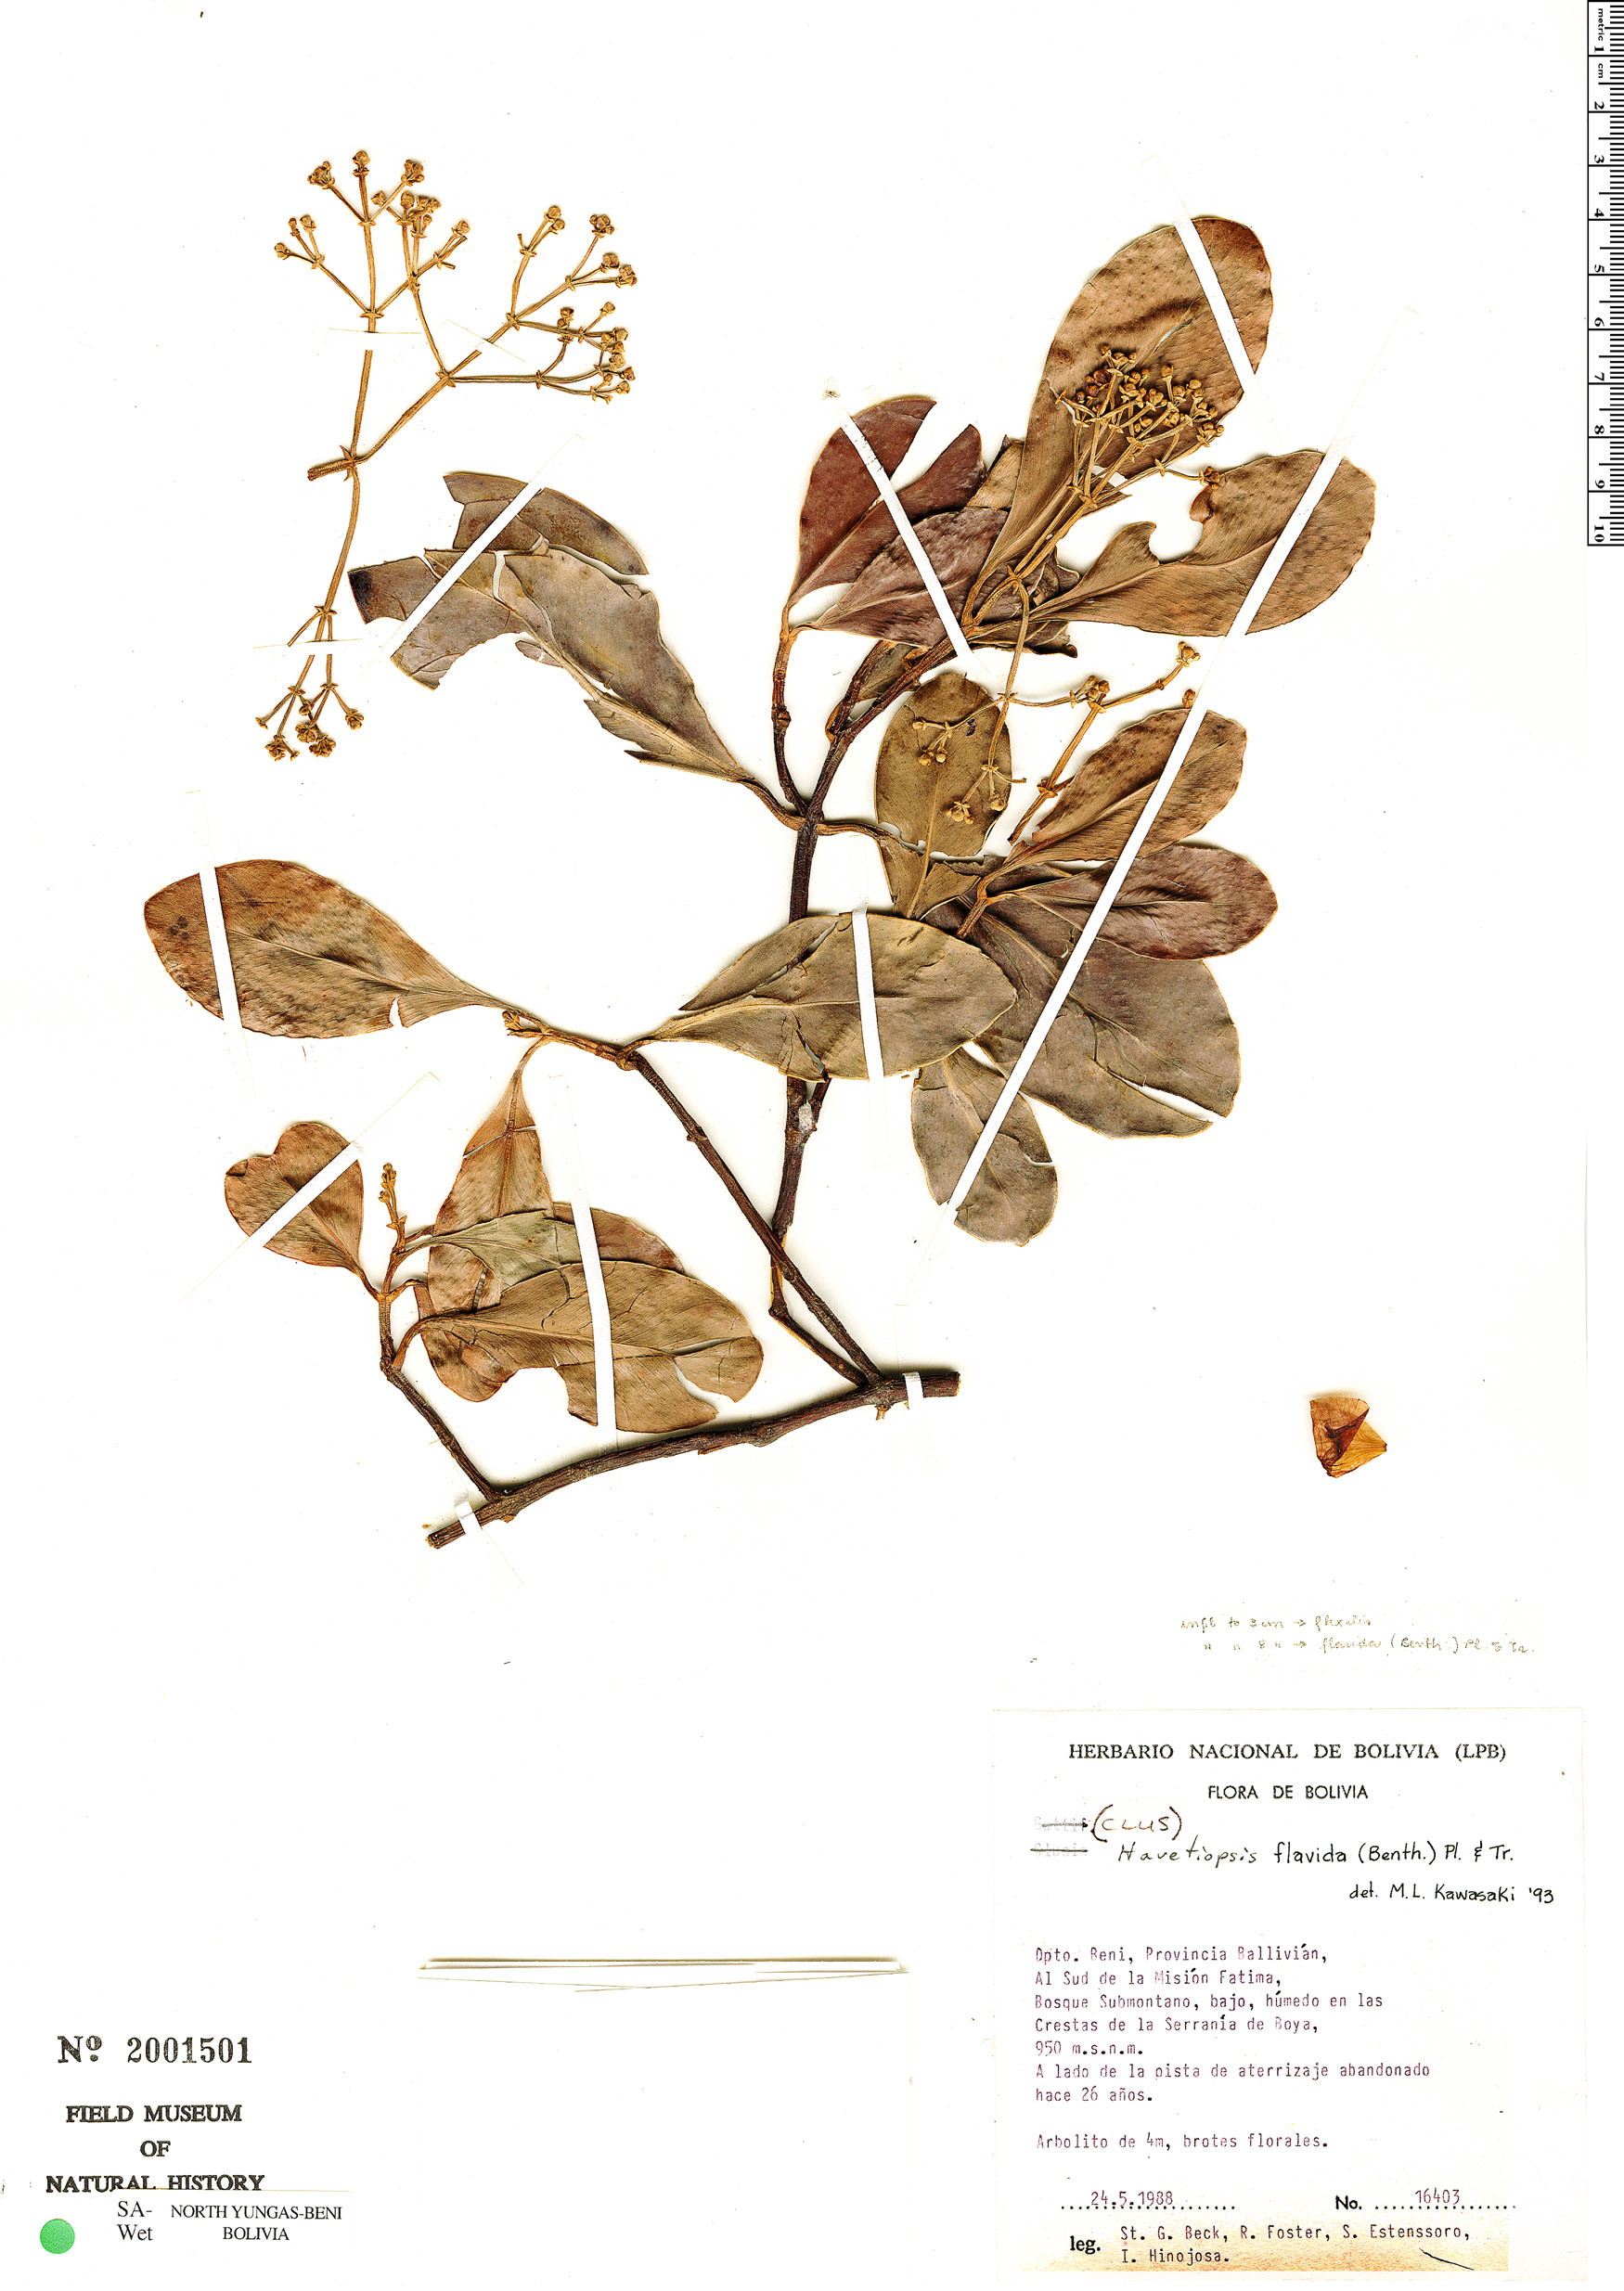 Specimen: Clusia flavida